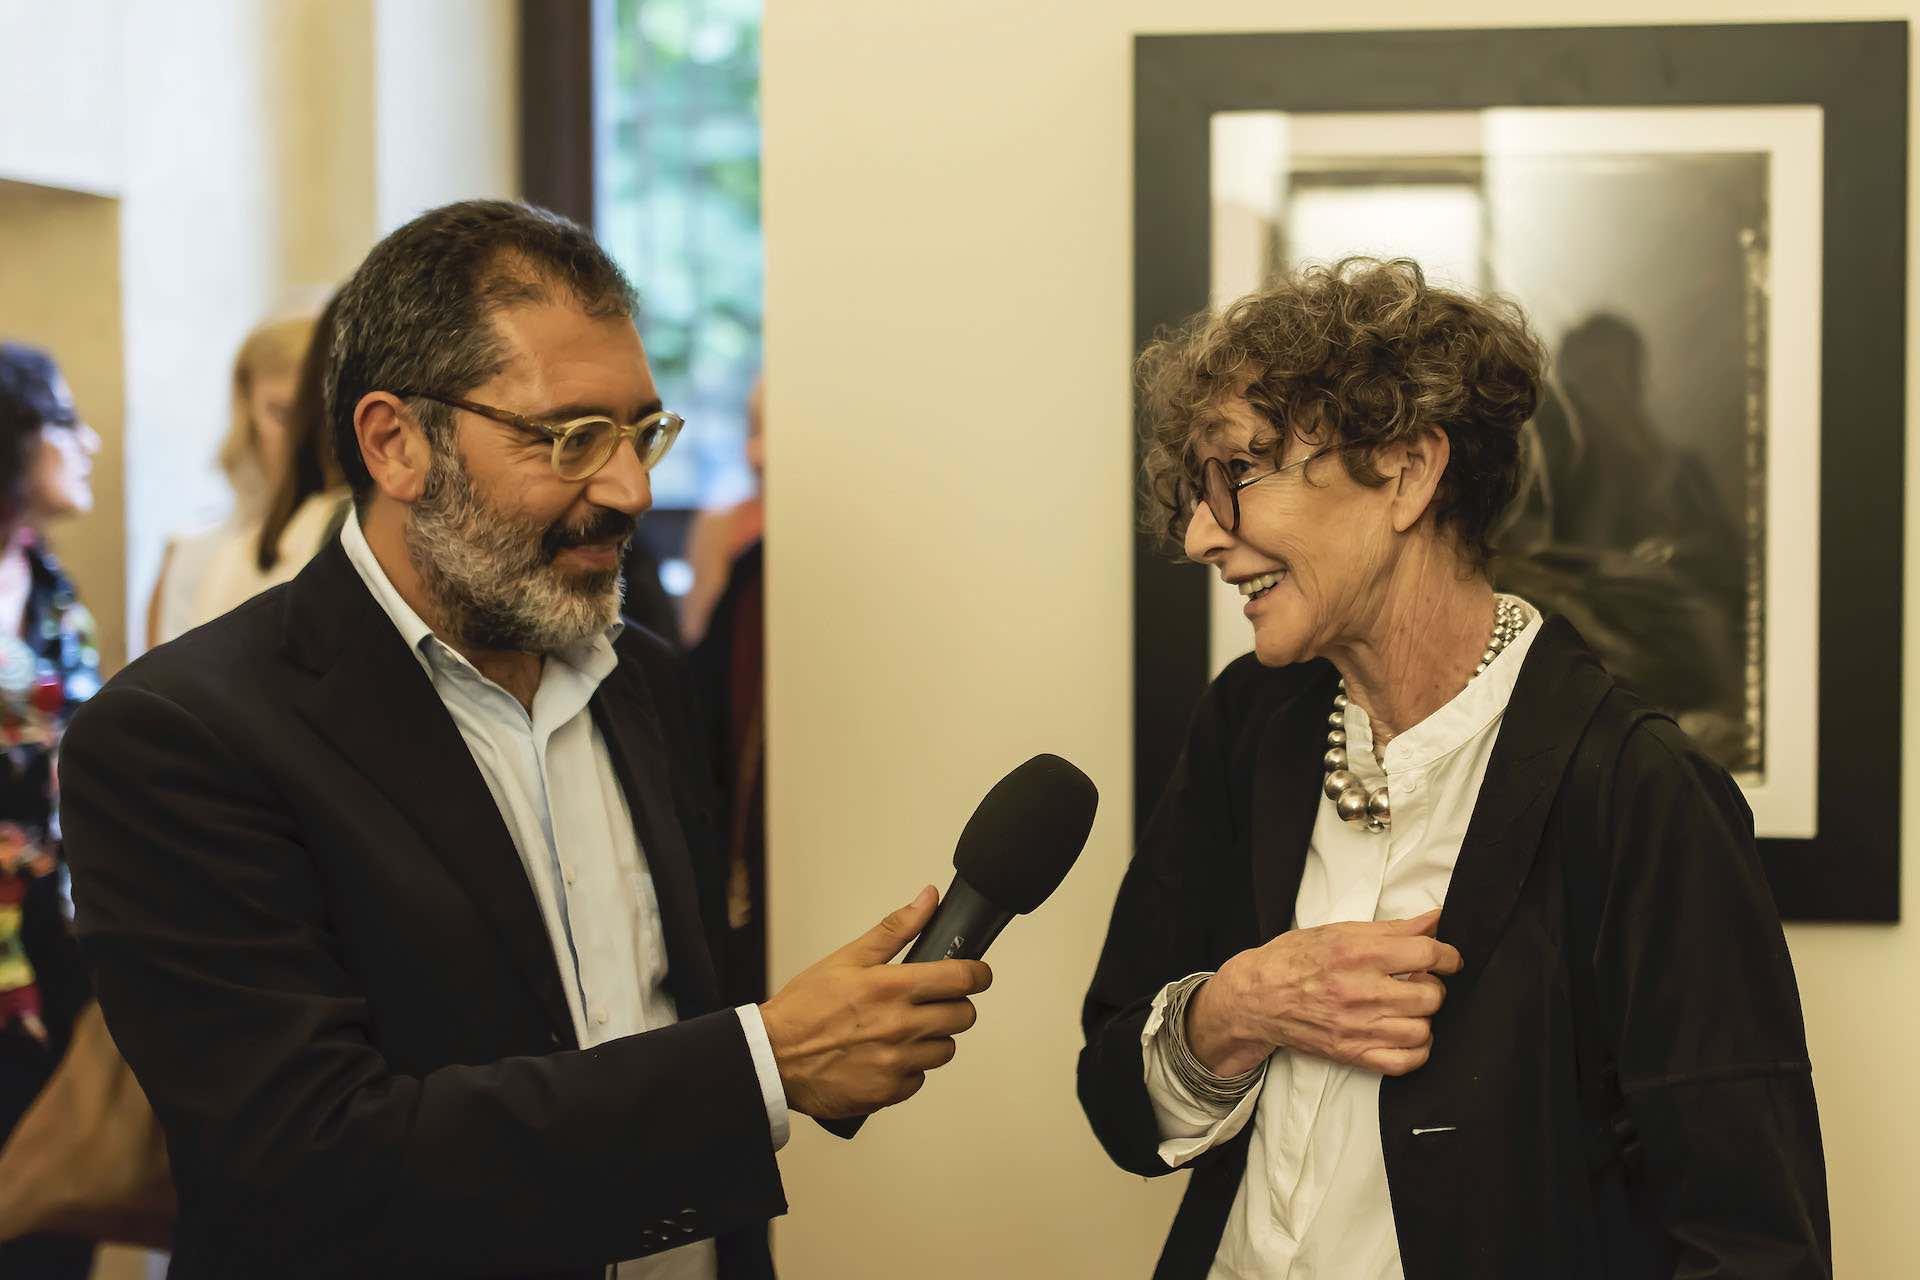 Sarah Moon intervistata da Luca Ponzi